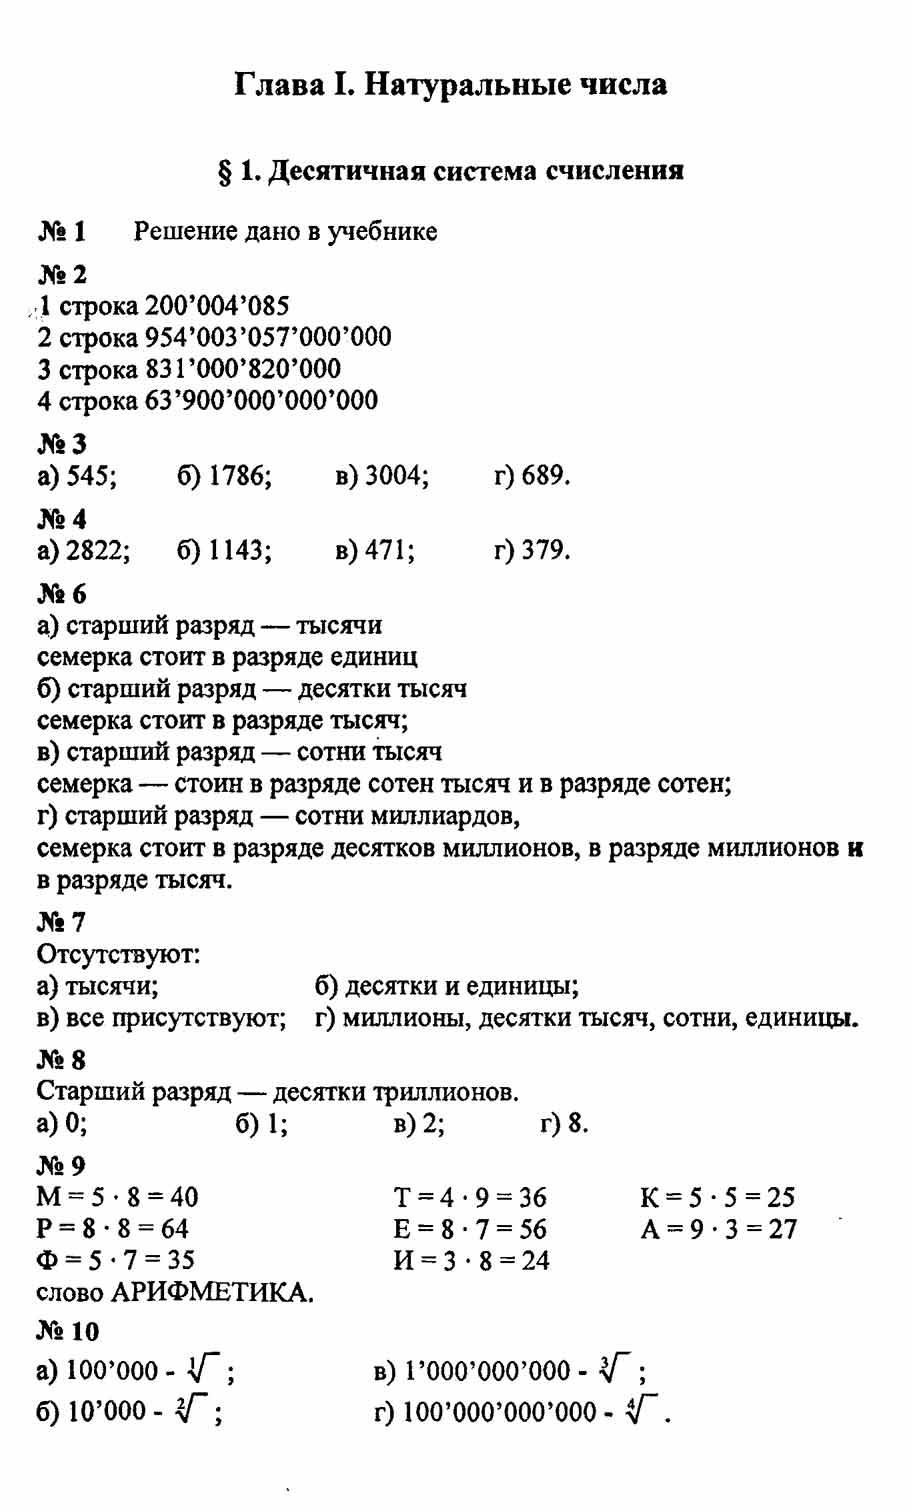 Гдз по математике 5 класс зубарева 2011